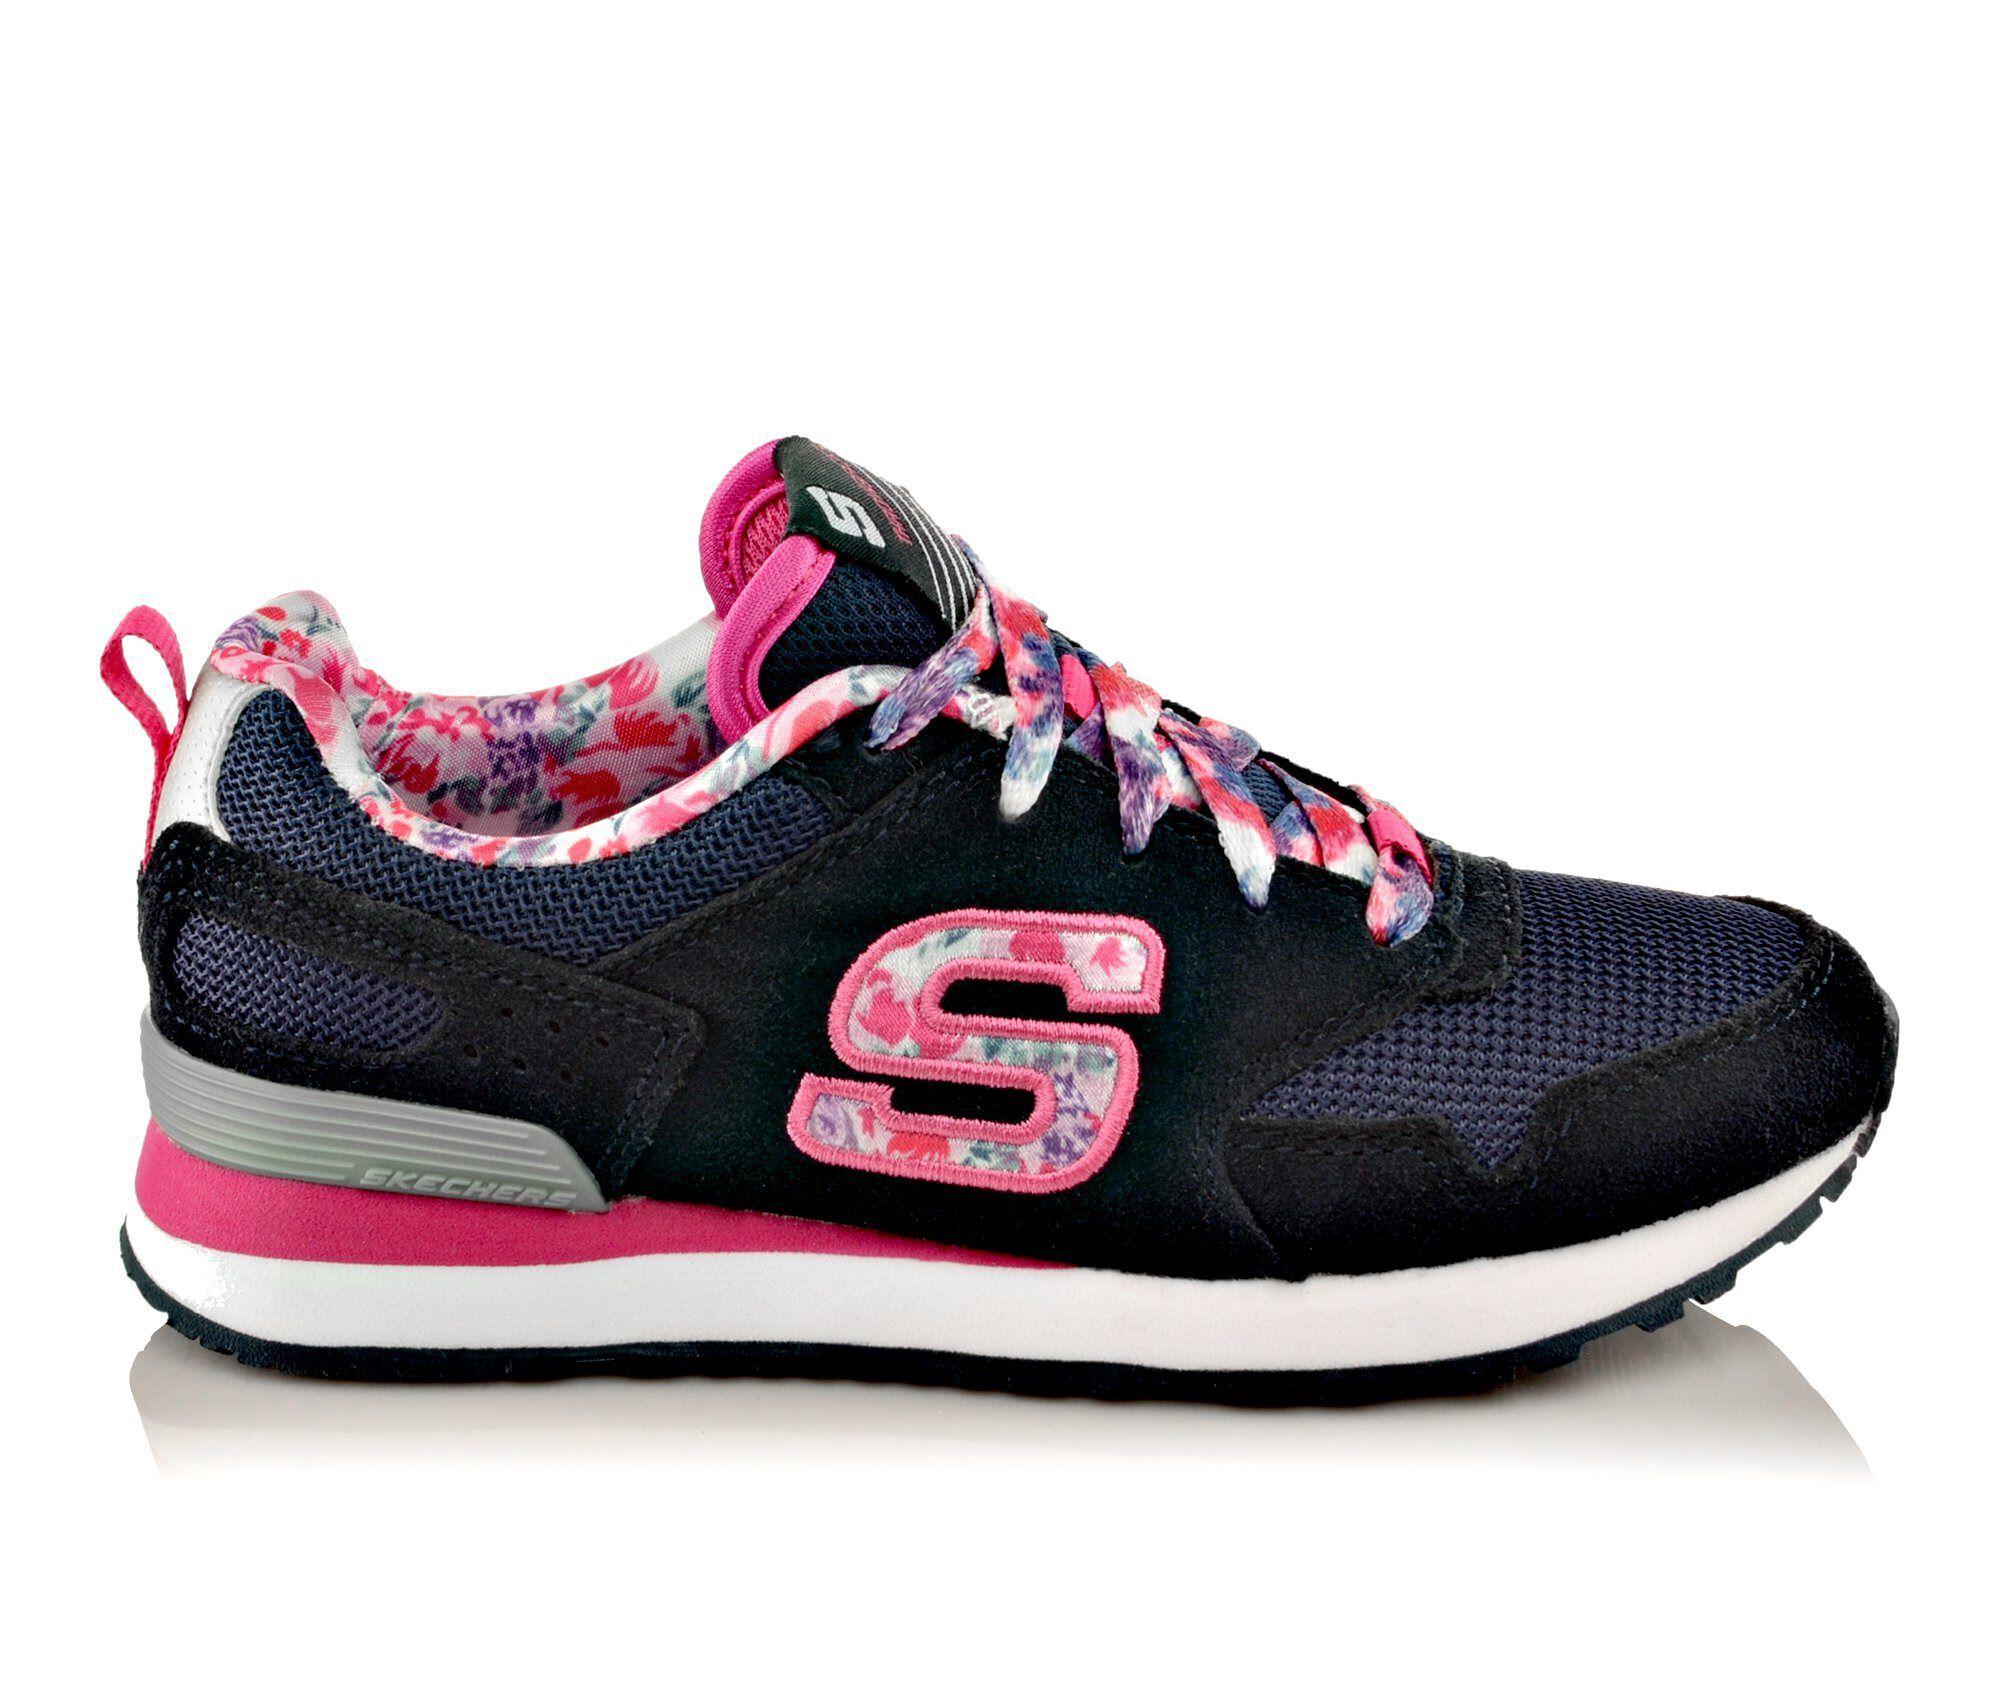 Images Girls Skechers RetrospectFloral Fancies Running Shoes